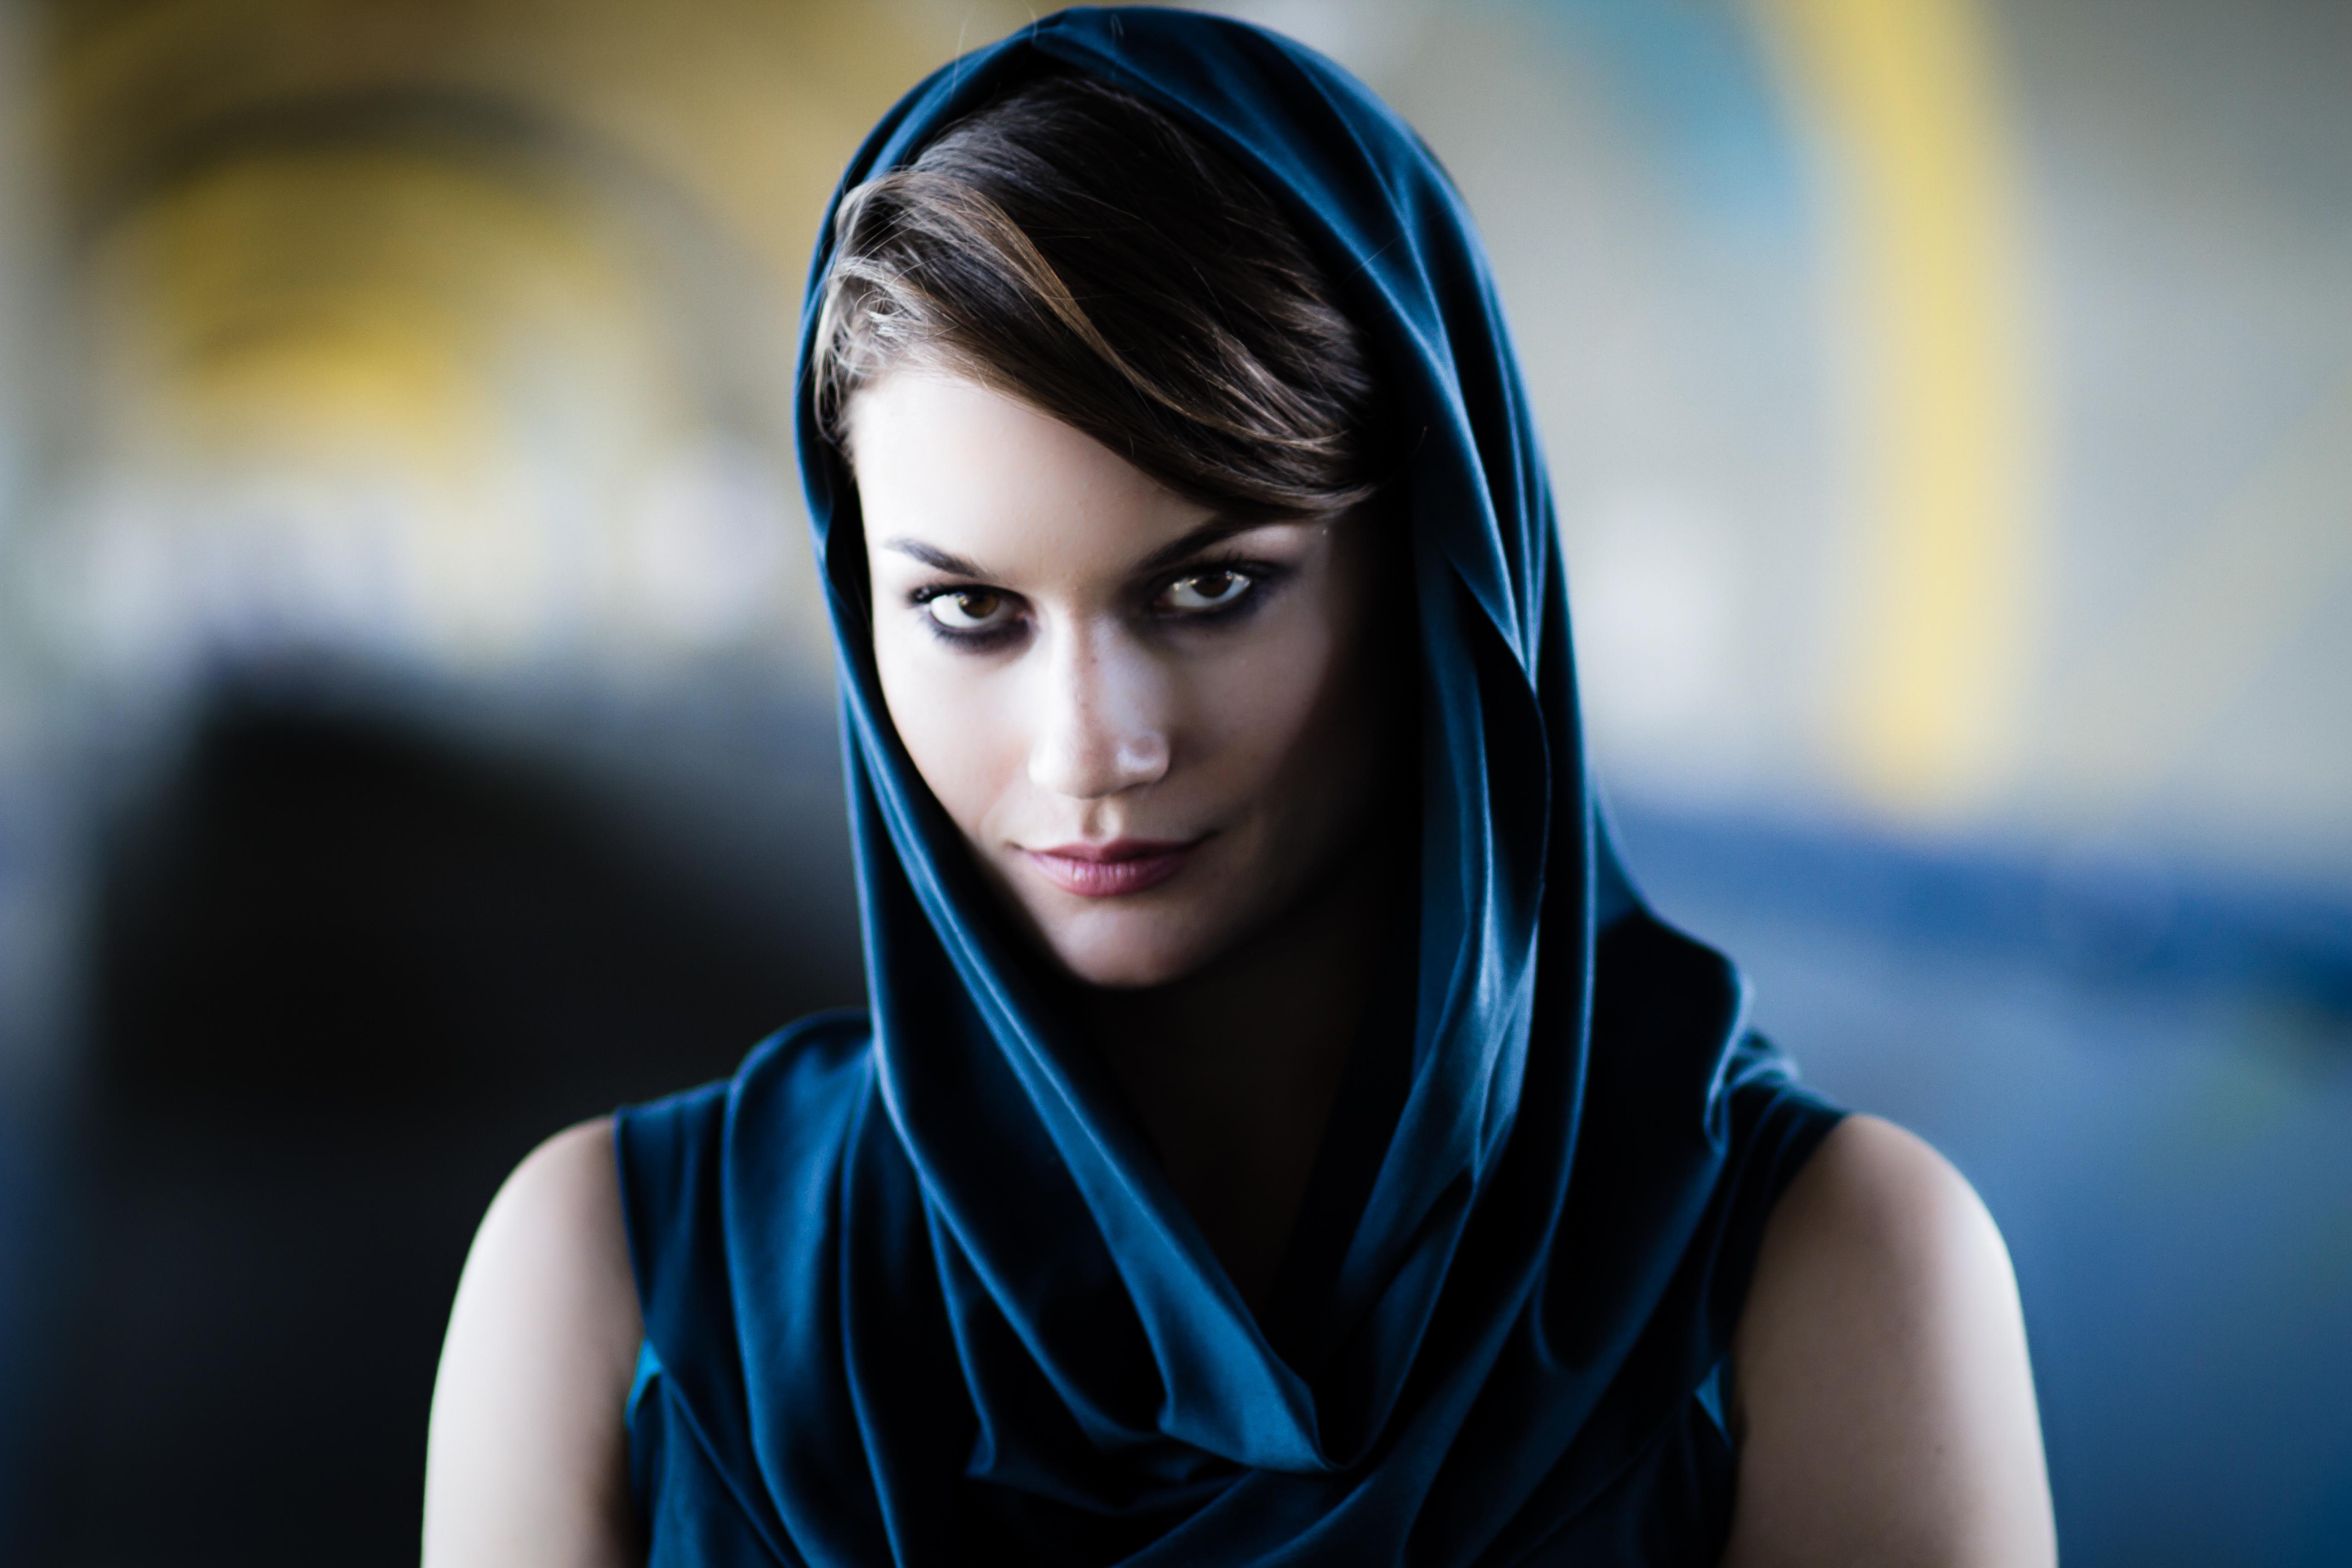 glamorous woman 4k hd desktop wallpaper for 4k ultra hd tv - HD1600×1066